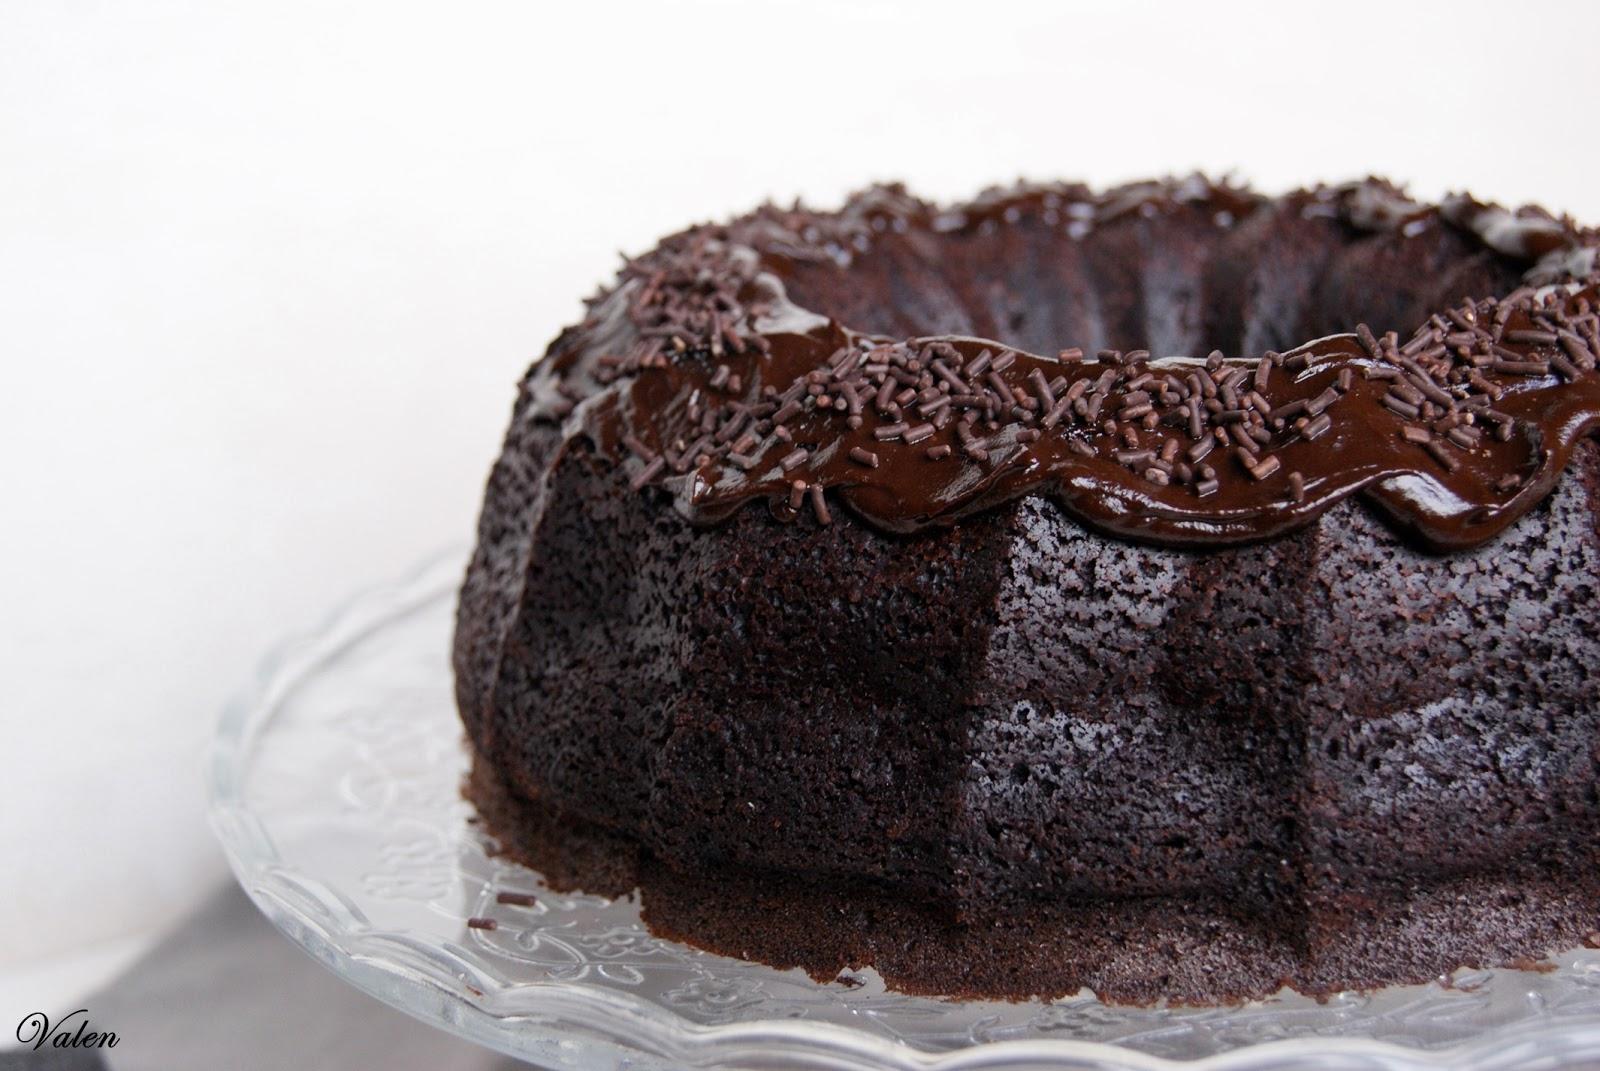 Valentina en la cocina: Chocolate & Guinness Bundt Cake